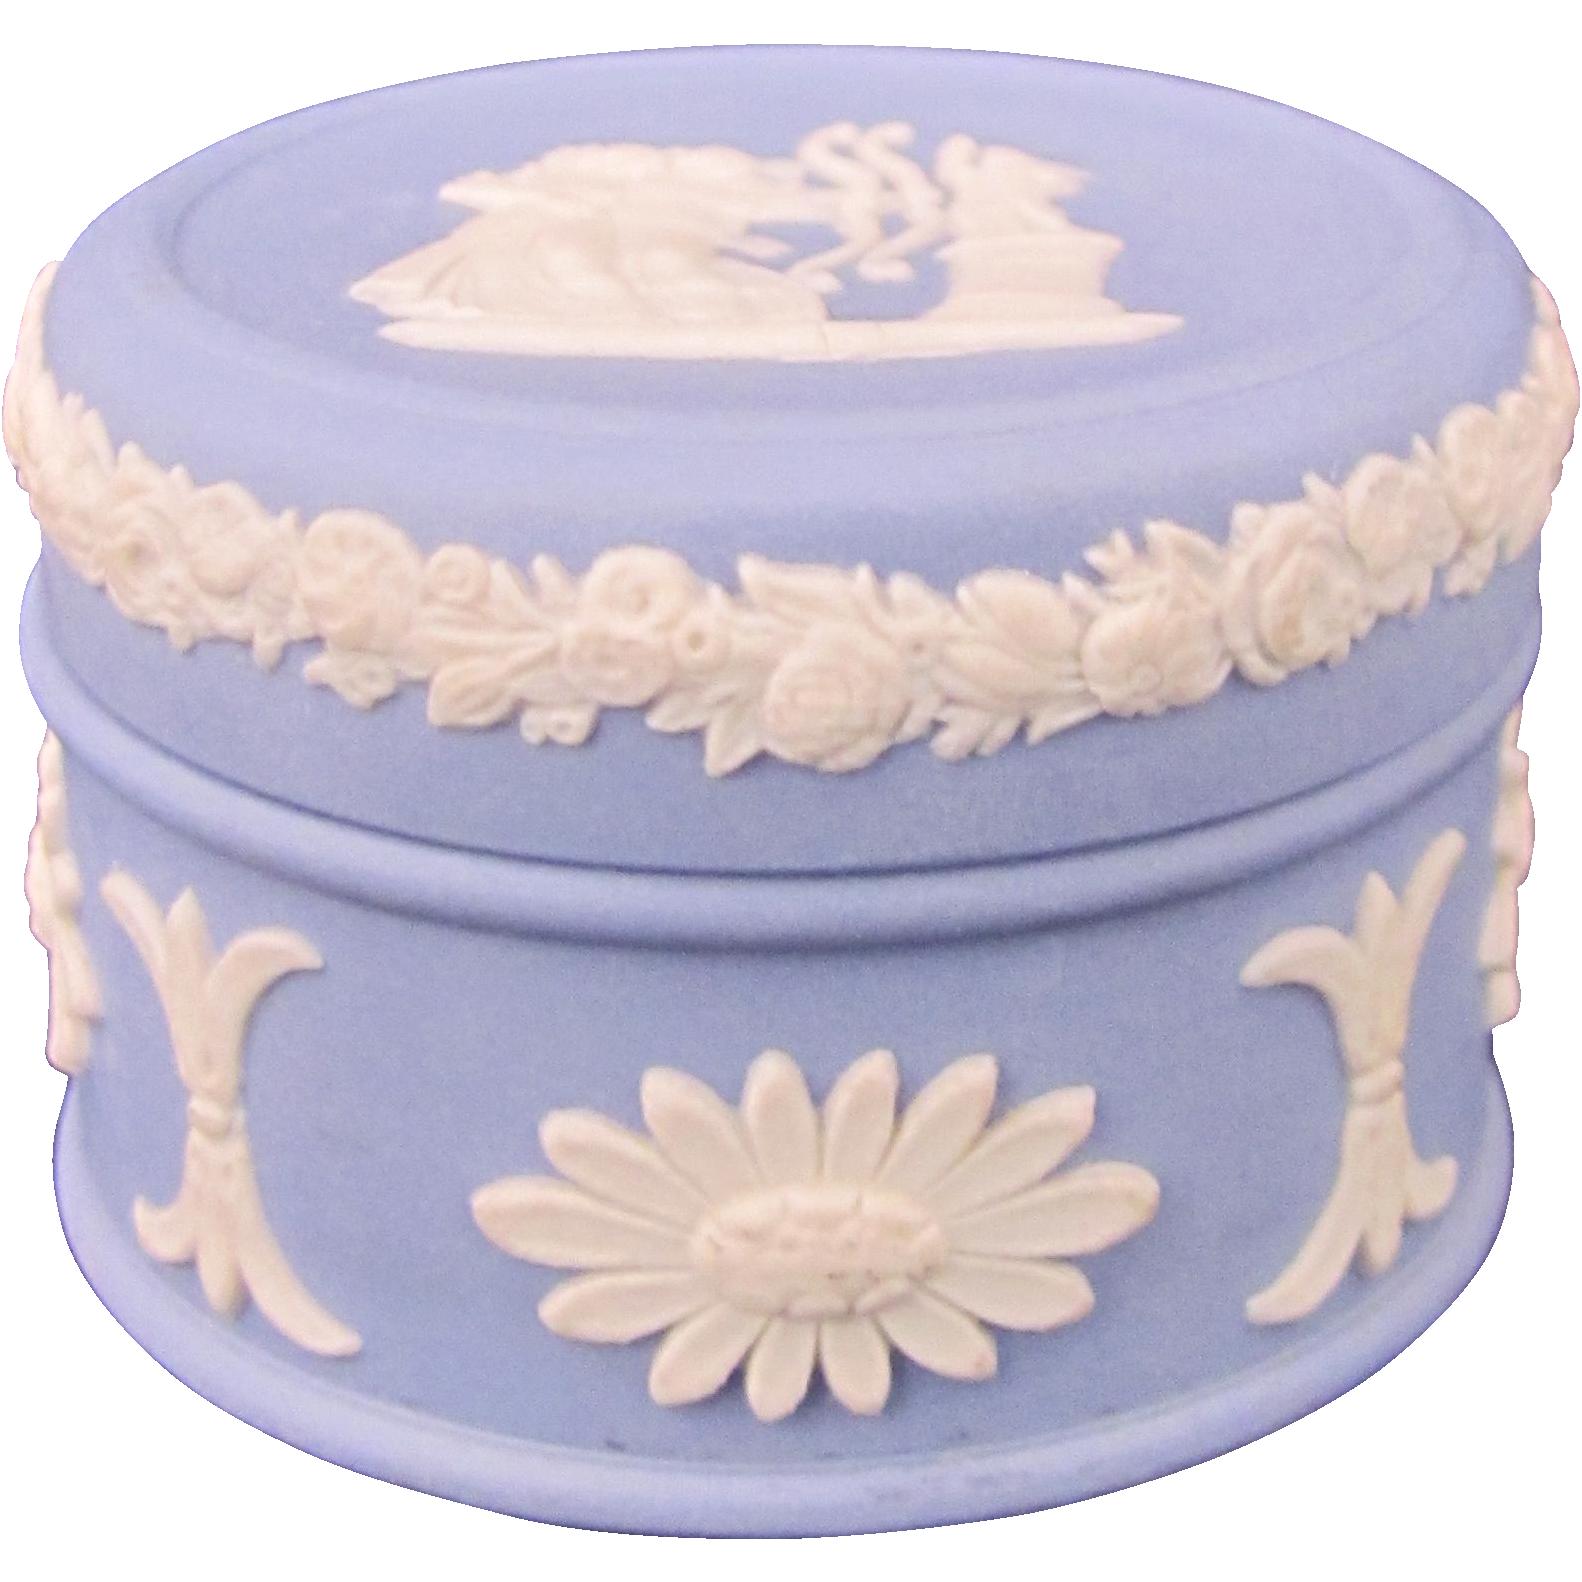 Wedgwood Jasperware Blue Trinket or Pill Box